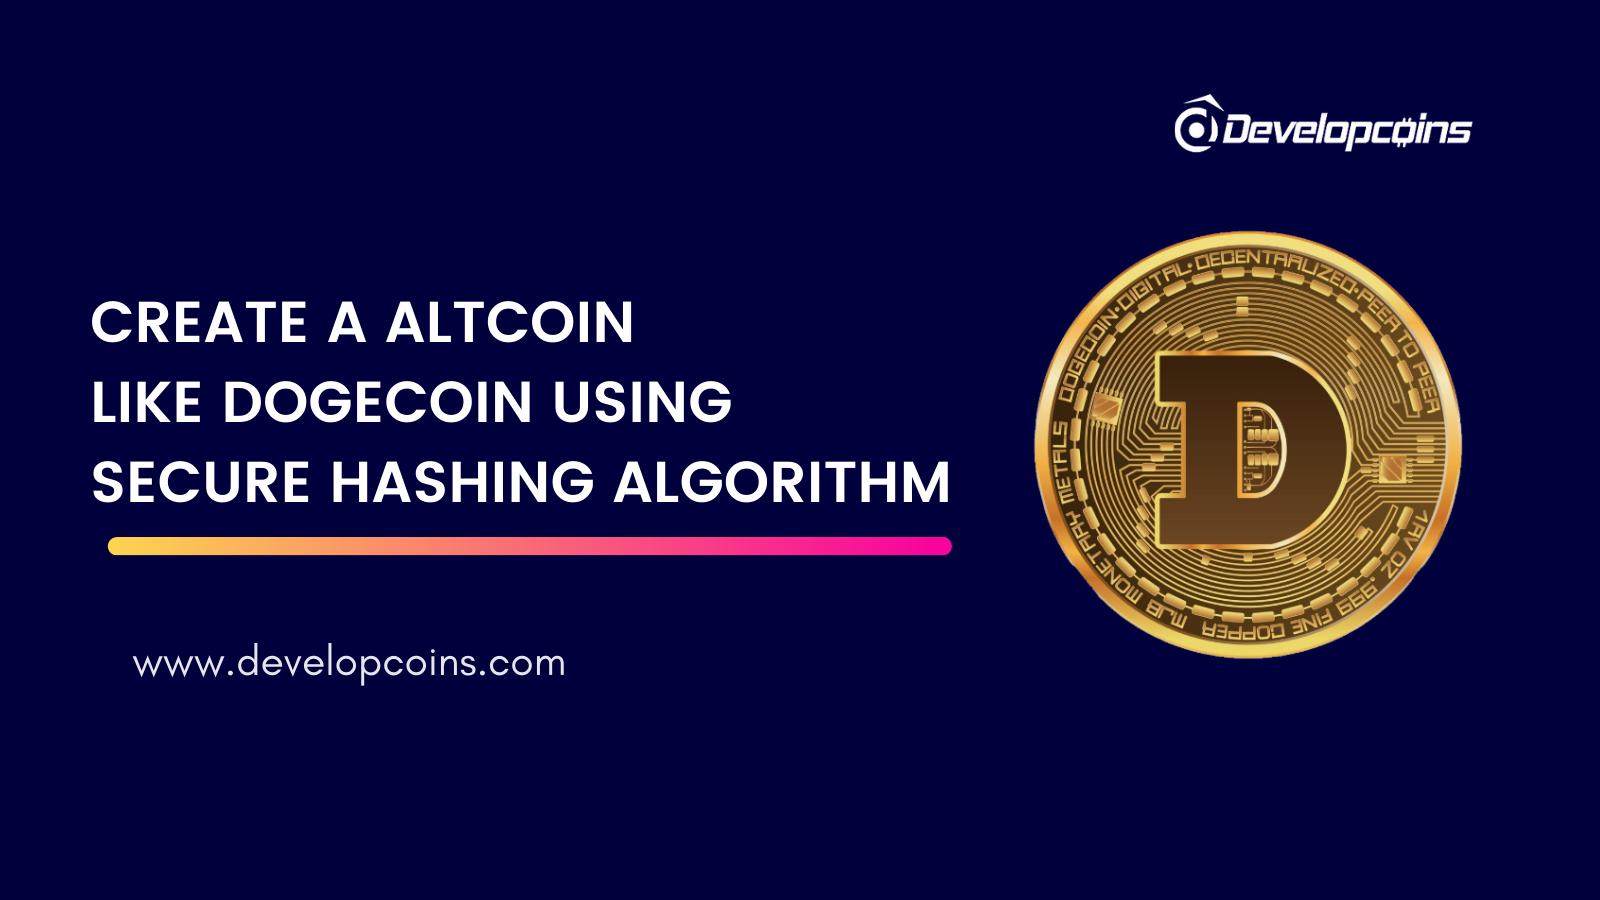 Altcoin Development To Create Altcoin like Dogecoin